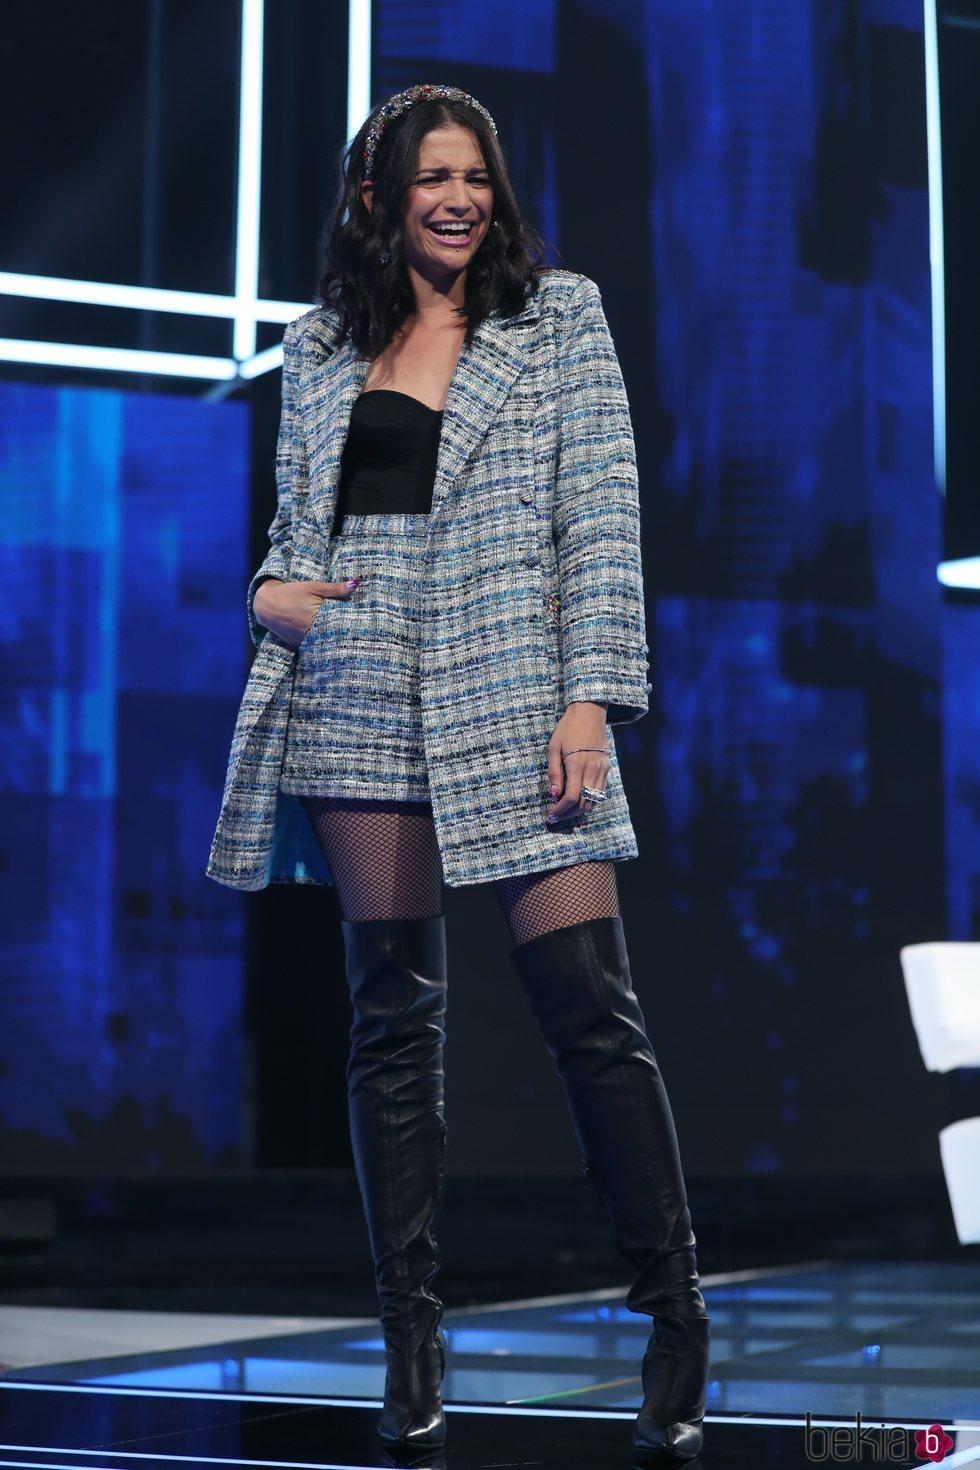 Natalia Jiménez en la Gala 2 de 'OT 2020'